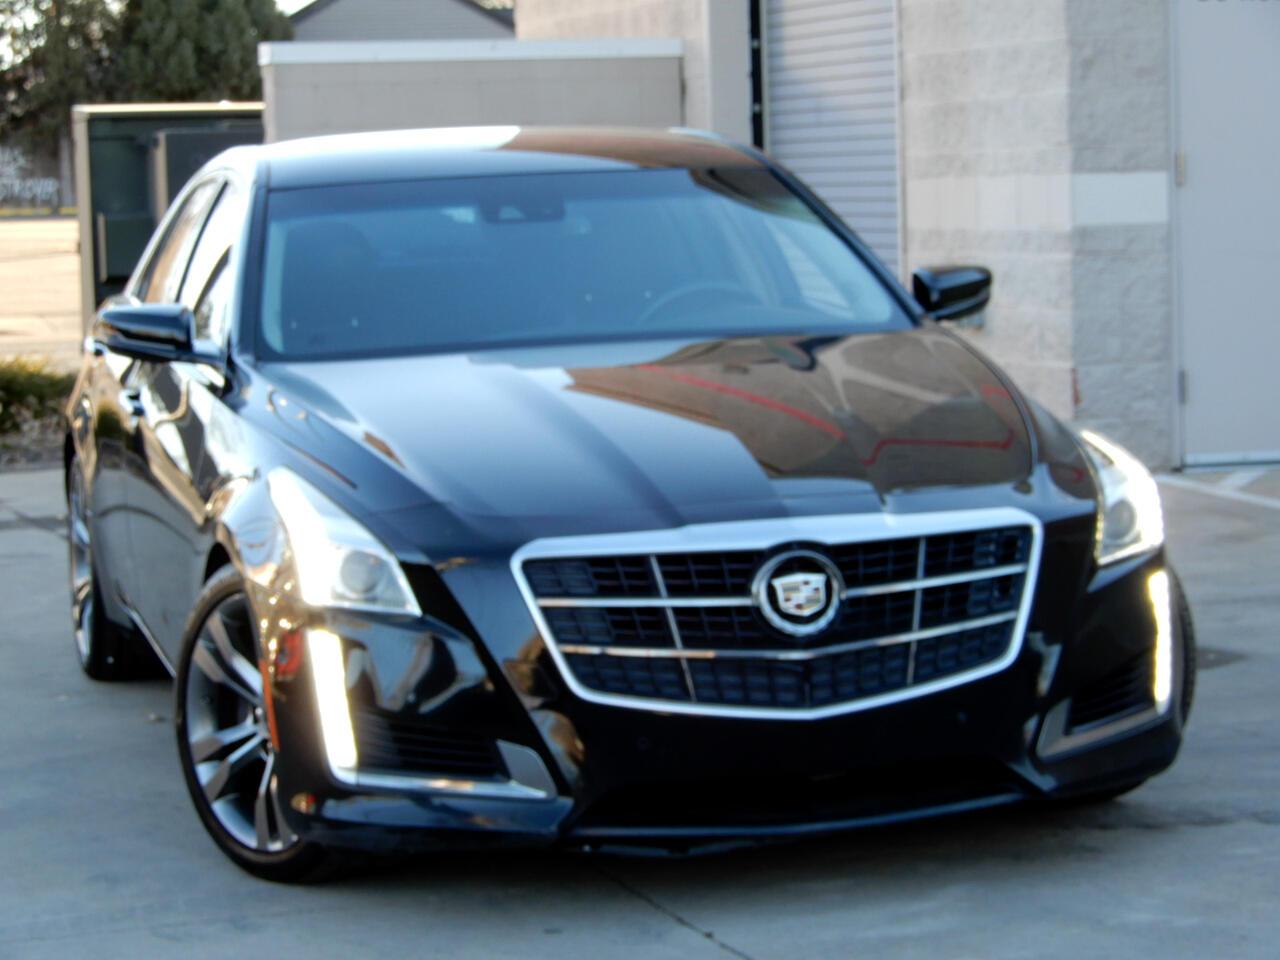 Cadillac CTS Sedan 4dr Sdn 3.6L Twin Turbo Vsport RWD 2014